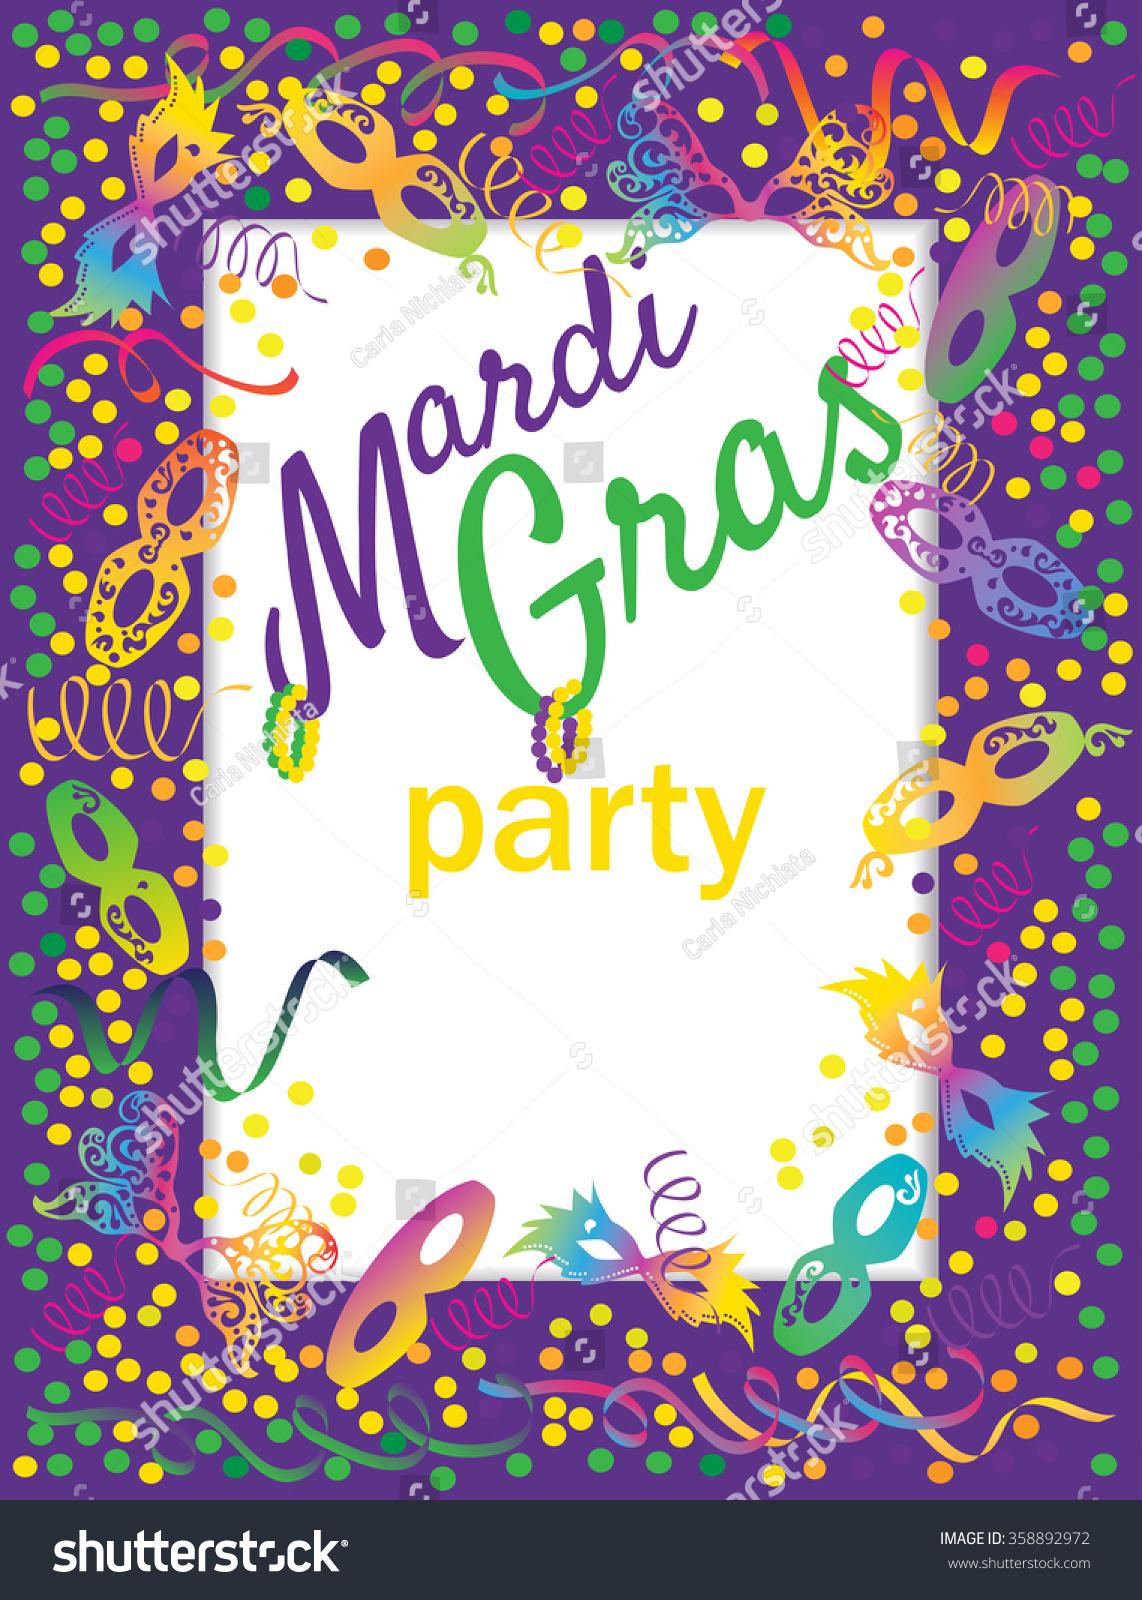 Mardi gras party invitations mardi gras party invitation backdrop vector stock vector 358892972 monicamarmolfo Choice Image